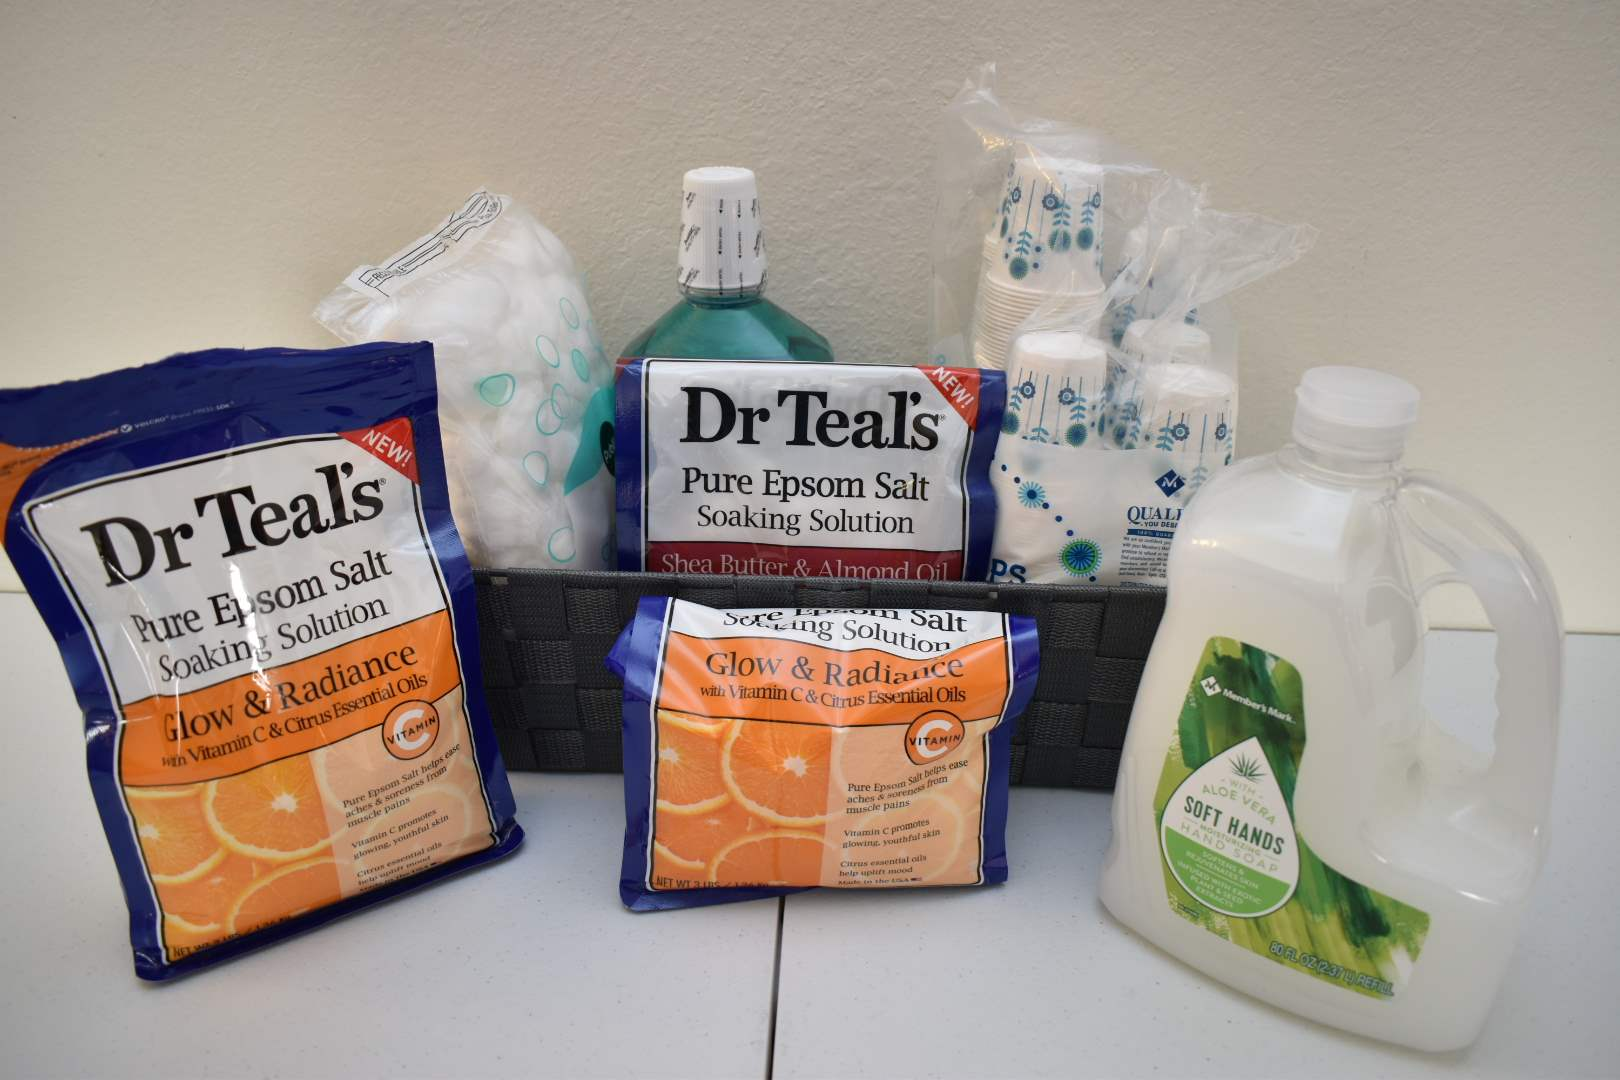 Dr. Teal's Infused Epsom Salts, Hand Soap, *Sealed* Mouthwash, 3oz. Paper Cups, Cotton Balls